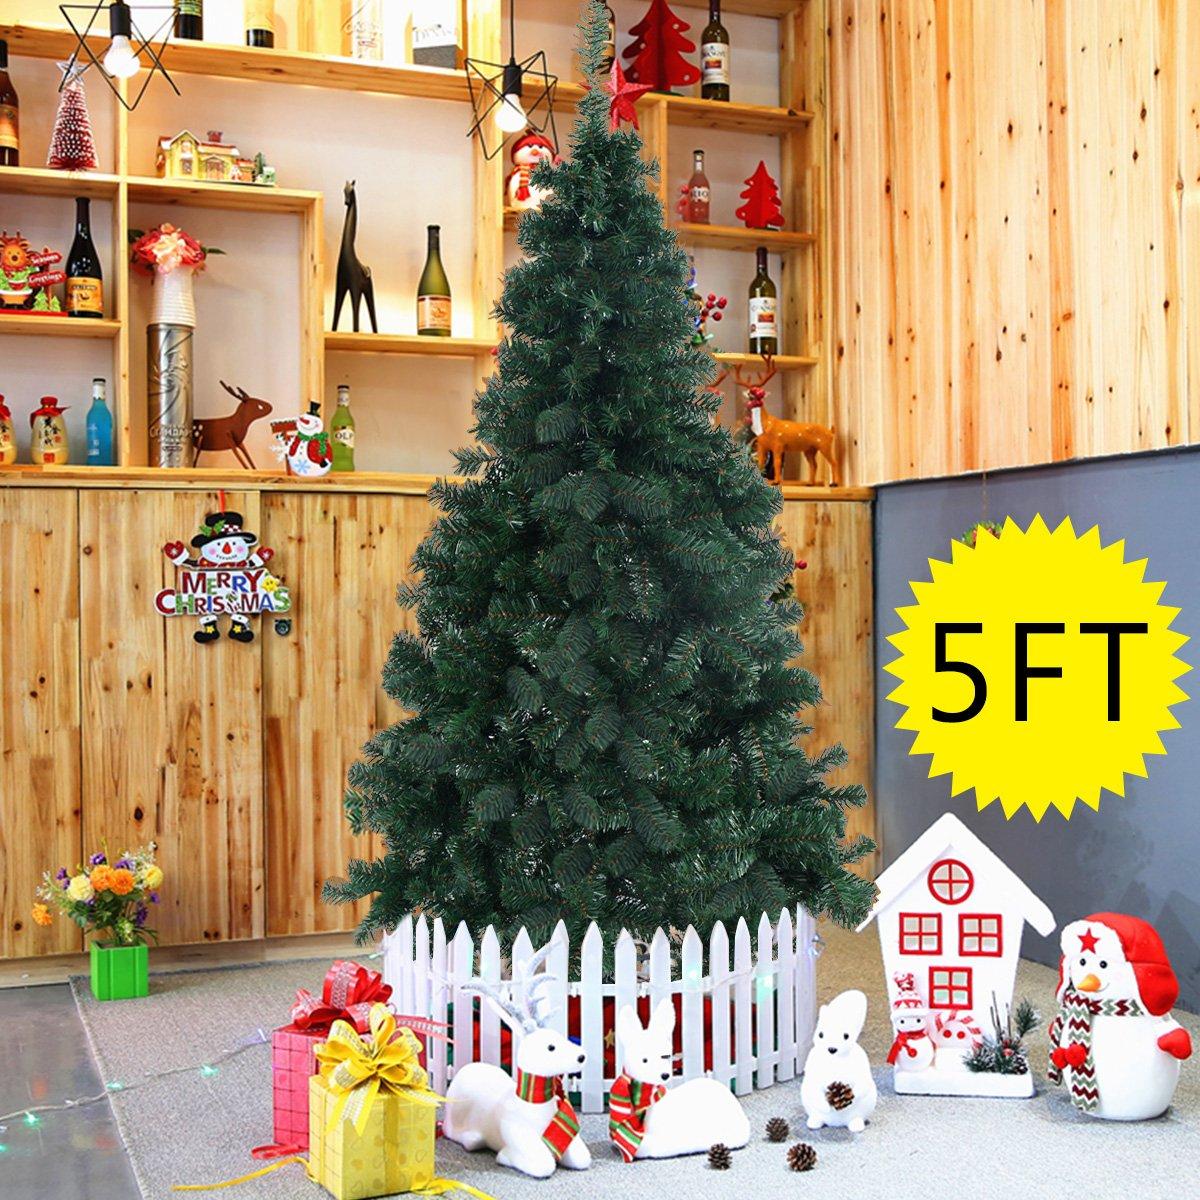 amazoncom goplus 5 ft artificial pvc christmas tree wstand holiday season indoor outdoor green beauty